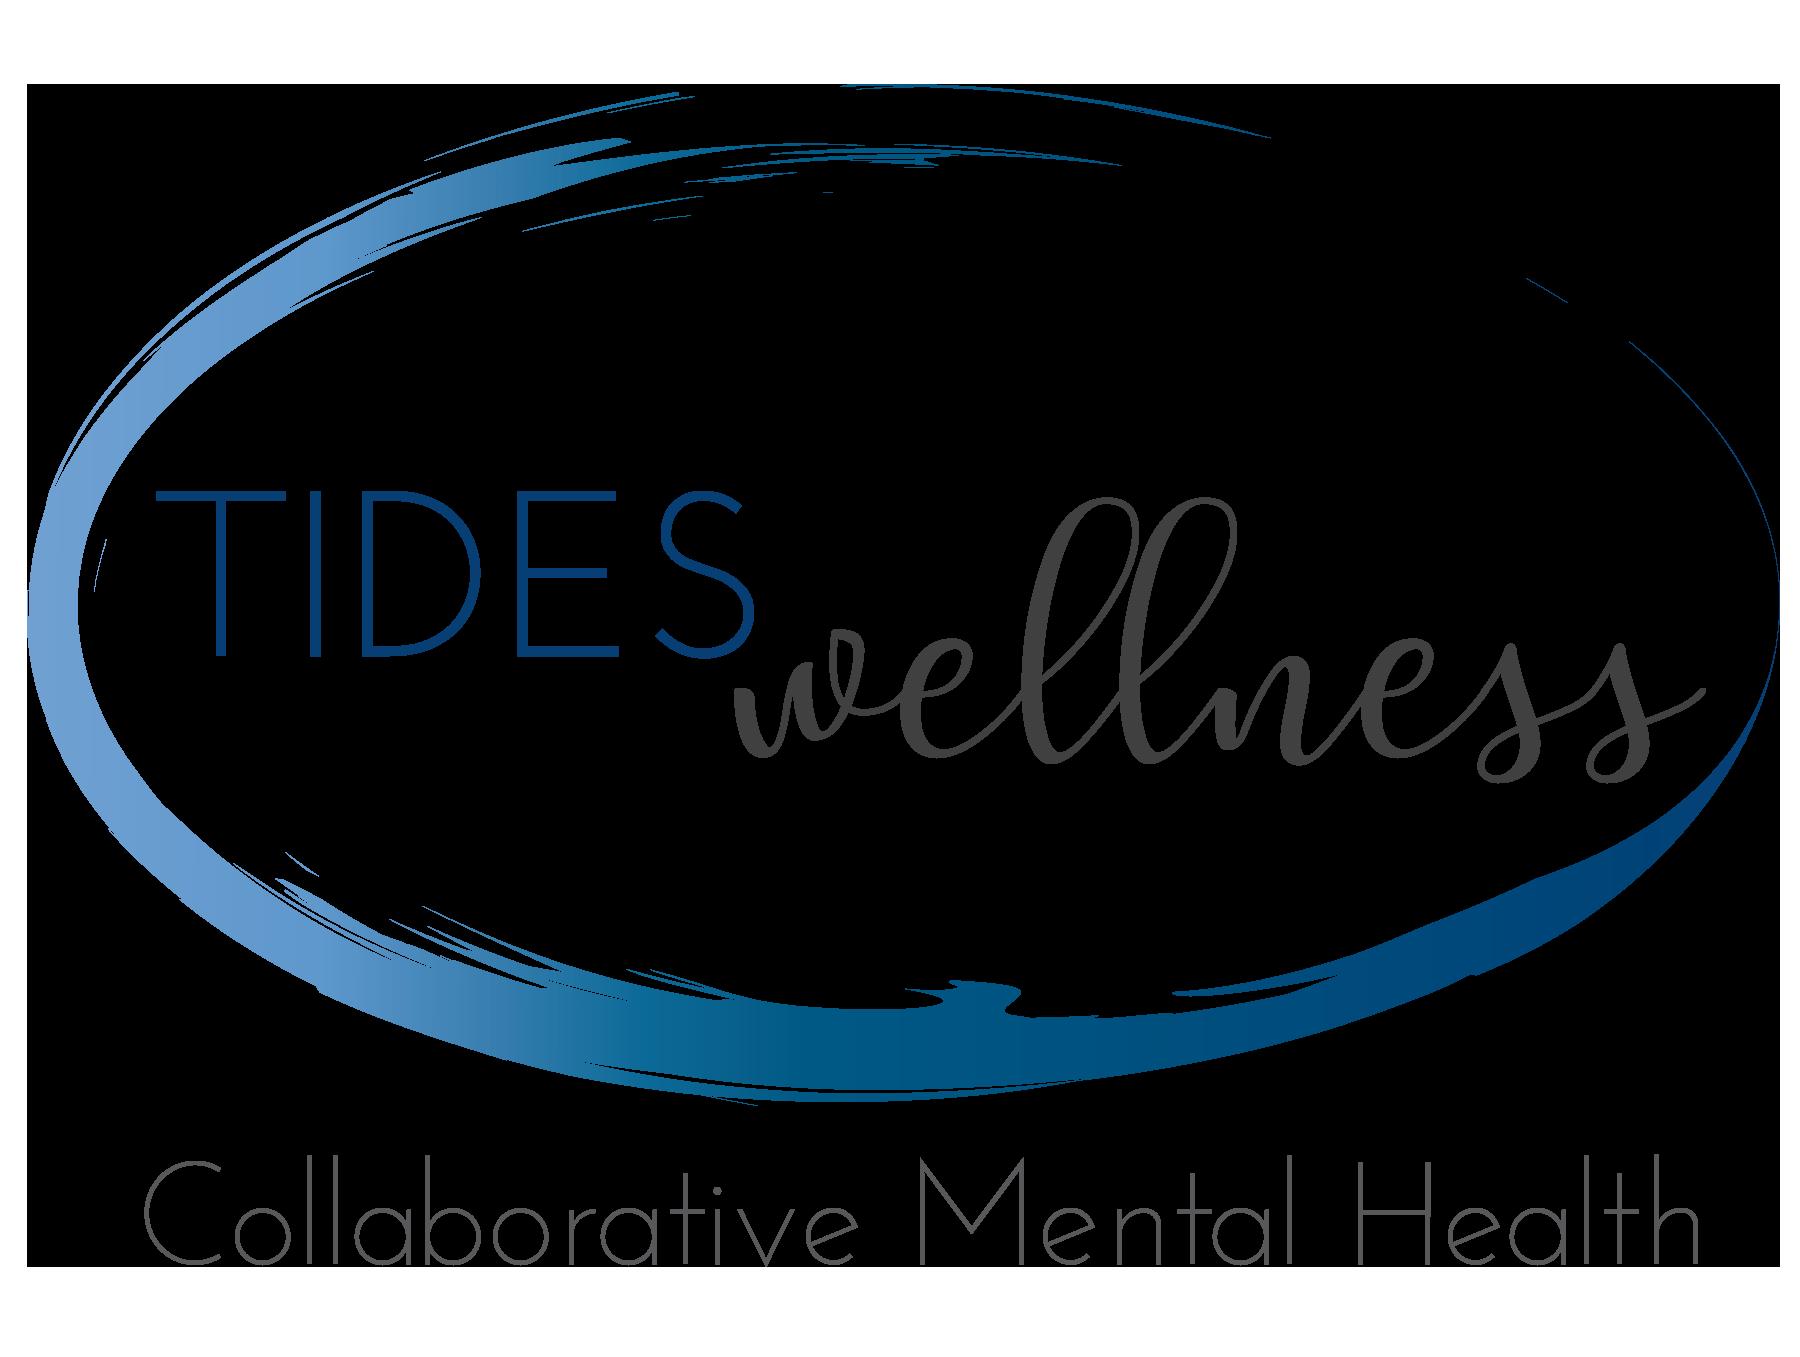 Tides Wellness